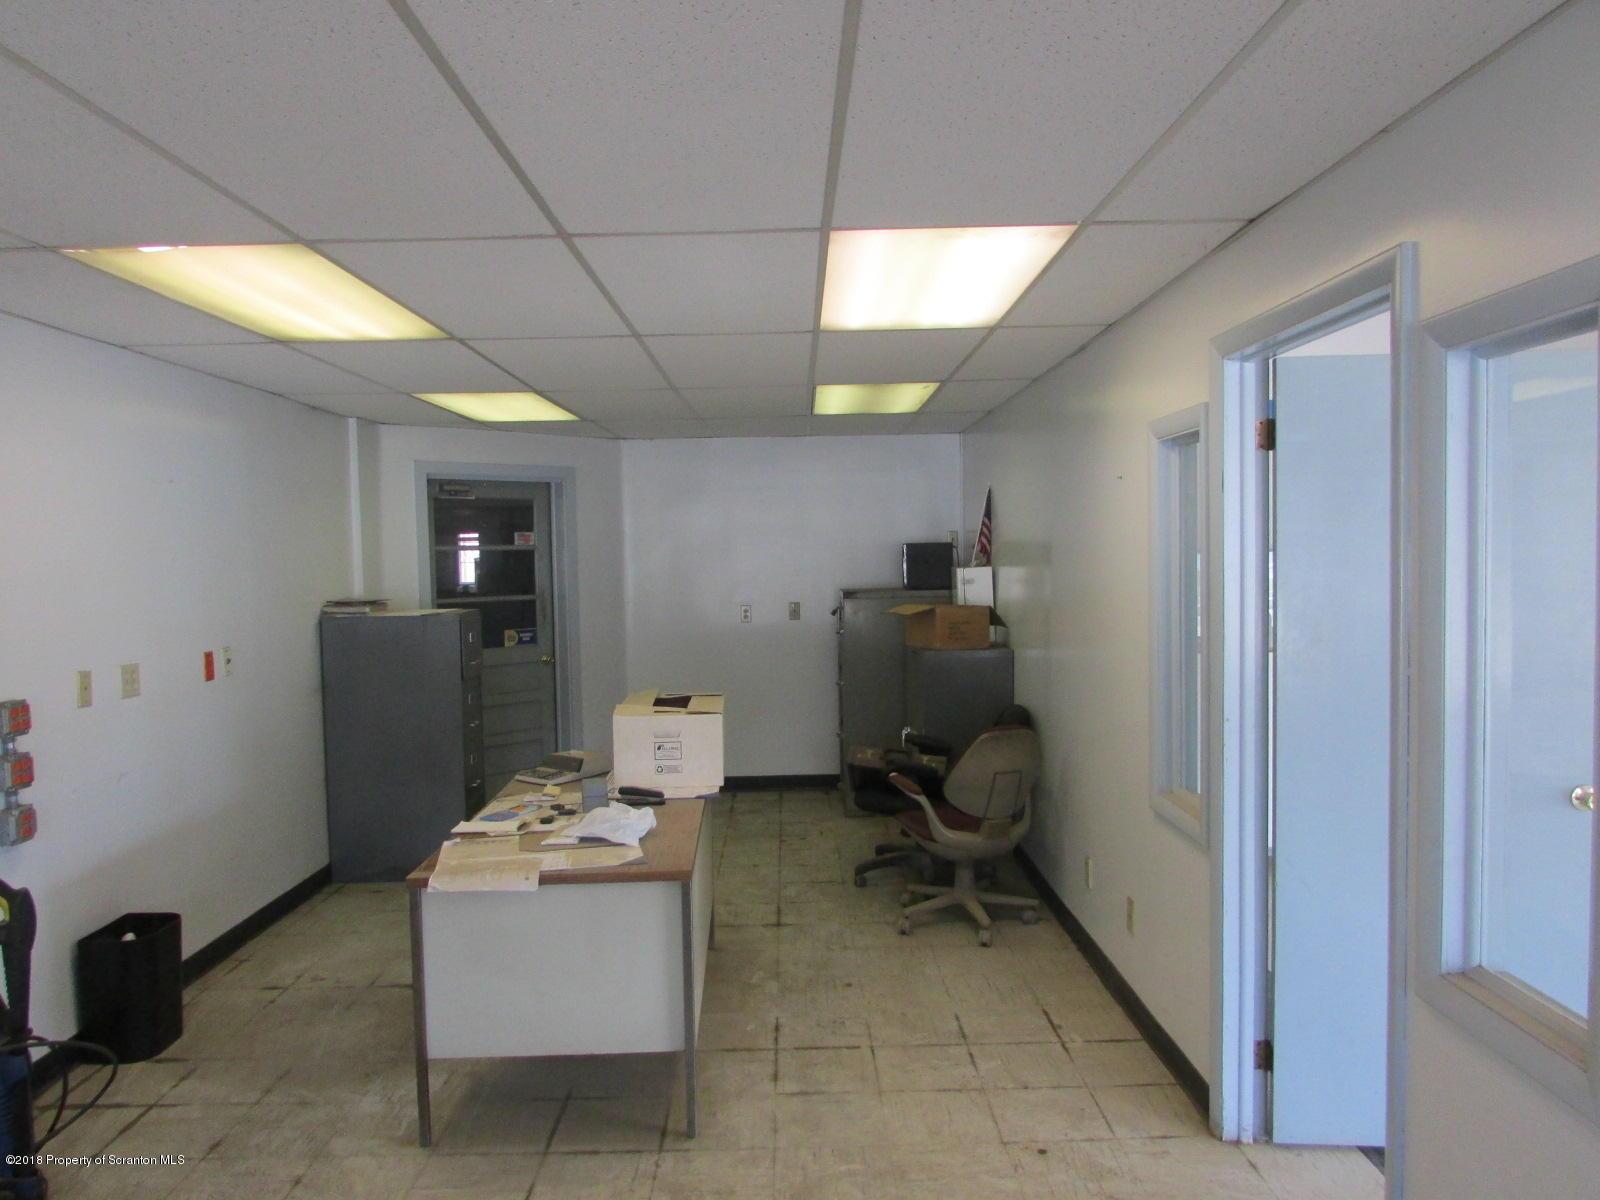 524 Grow Avenue, Montrose, Pennsylvania 18801, ,2 BathroomsBathrooms,Commercial,For Sale,Grow Avenue,18-1473